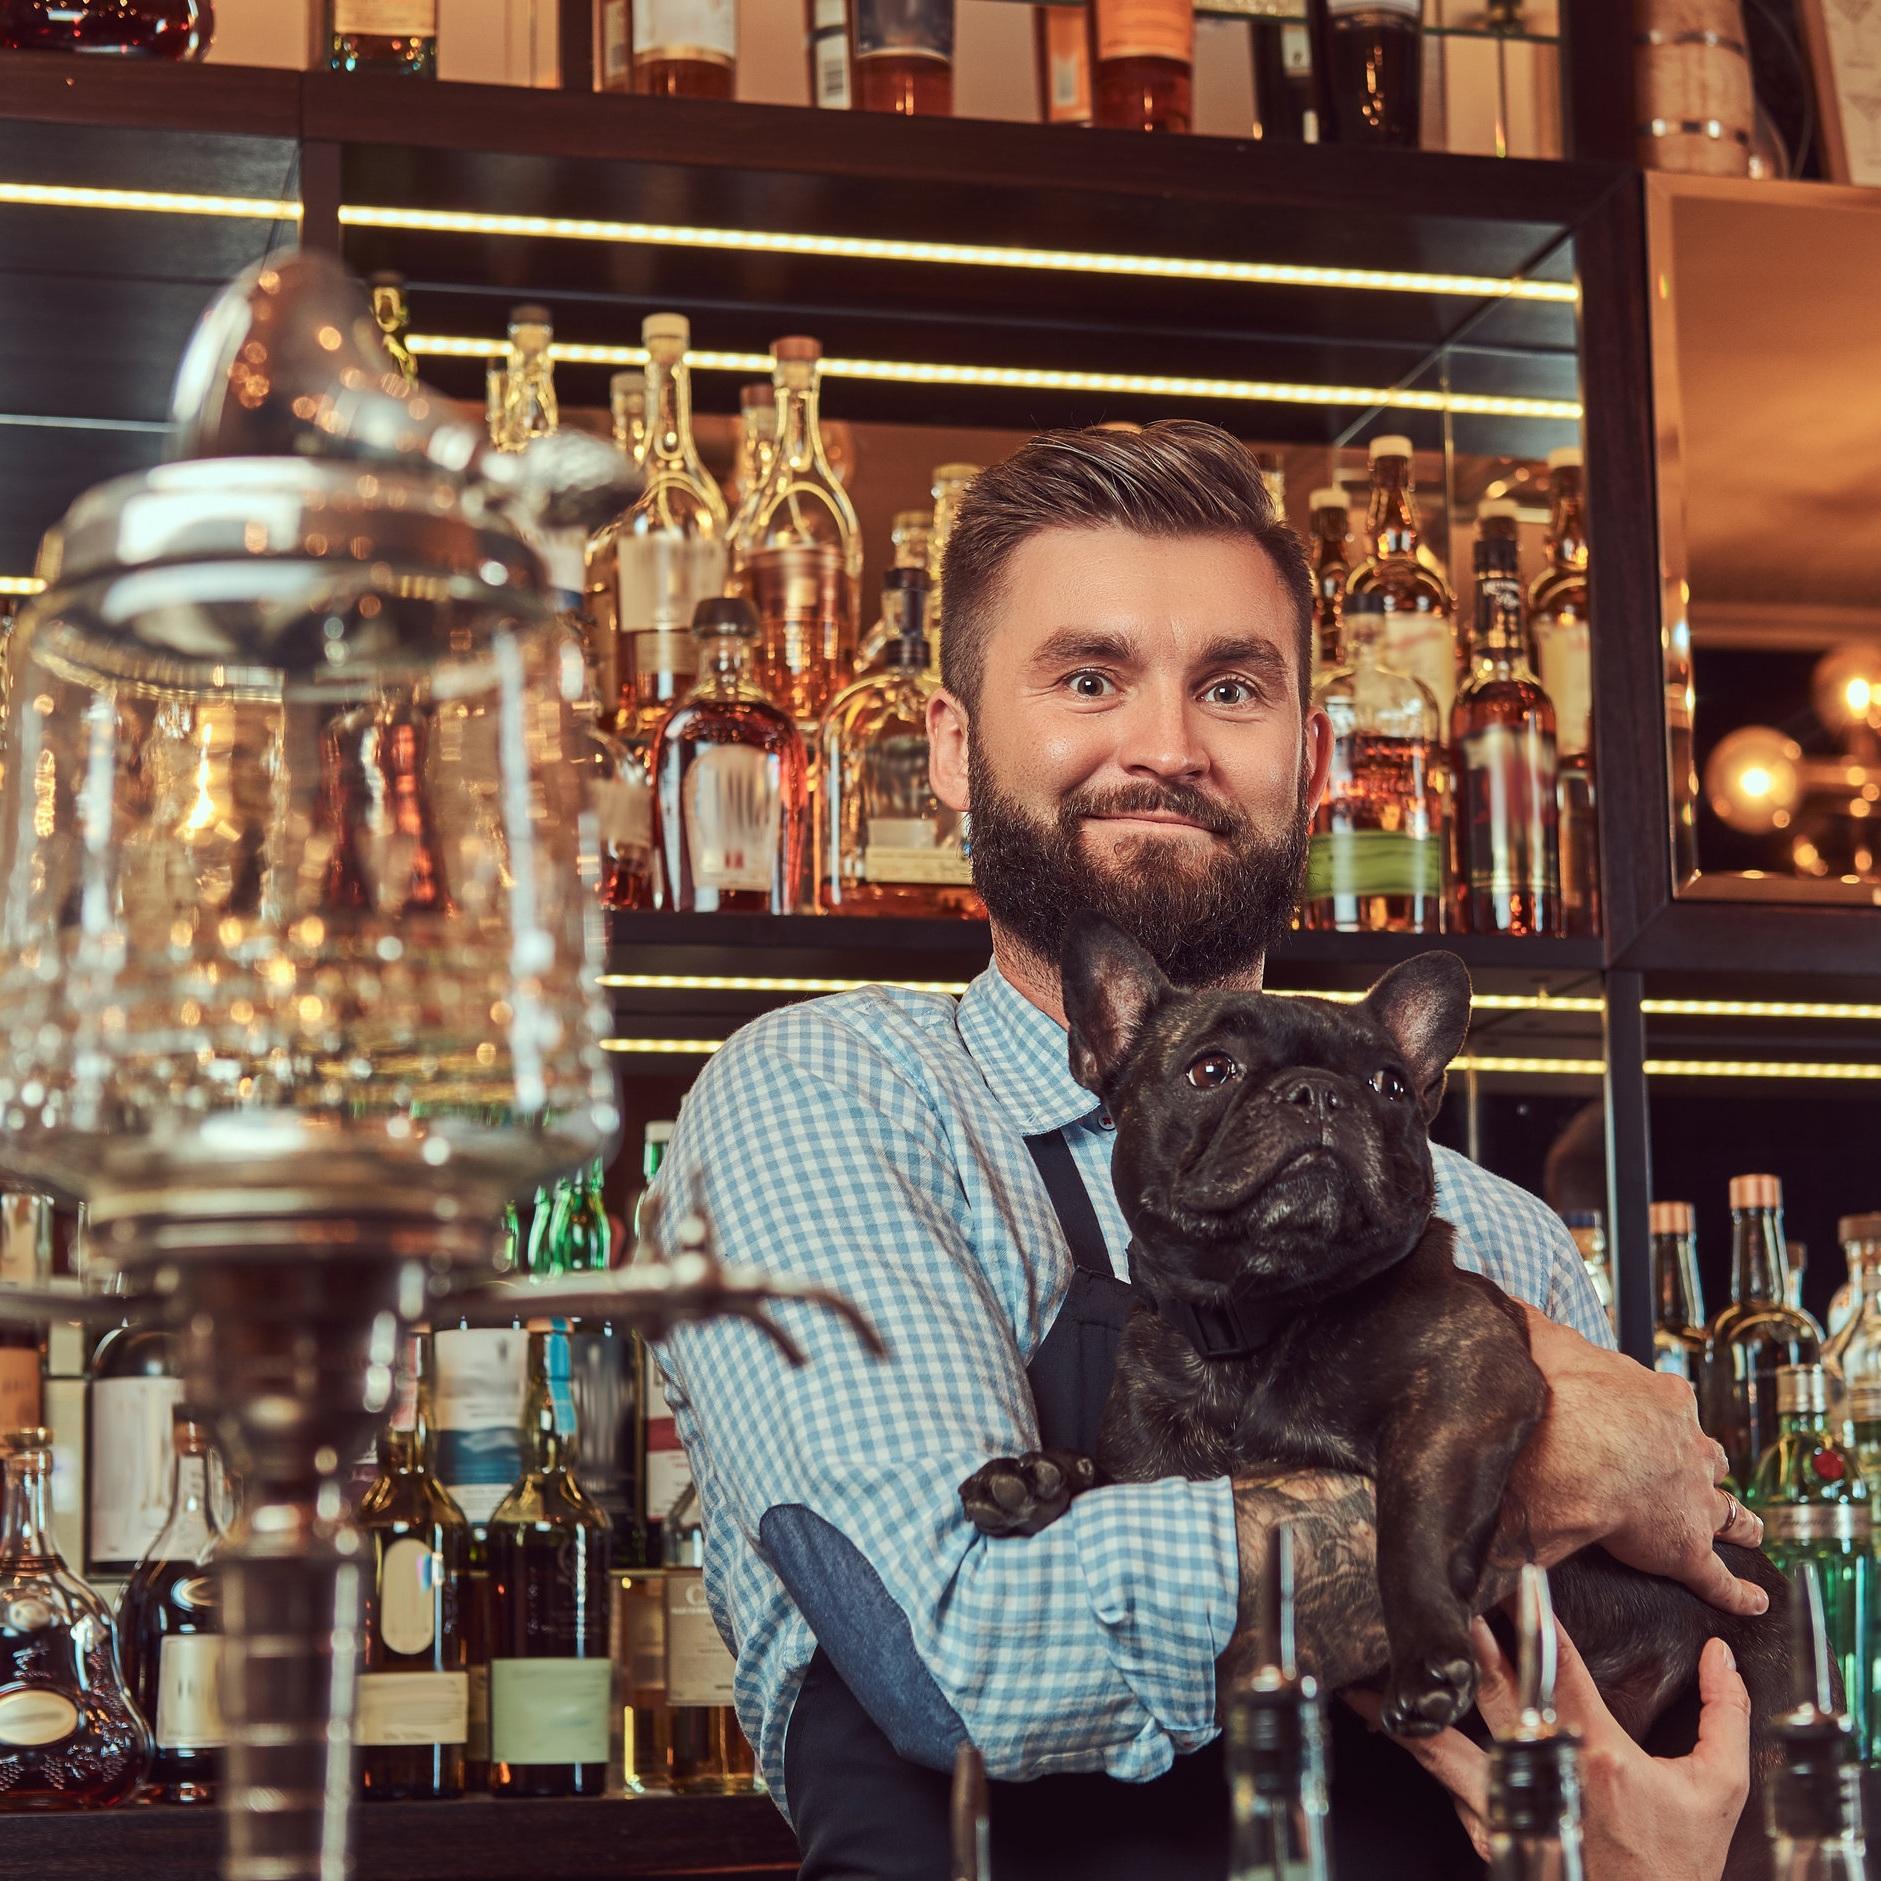 Canva+-+Bartender+Carrying+a+Black+Pug+in+Pub.jpg